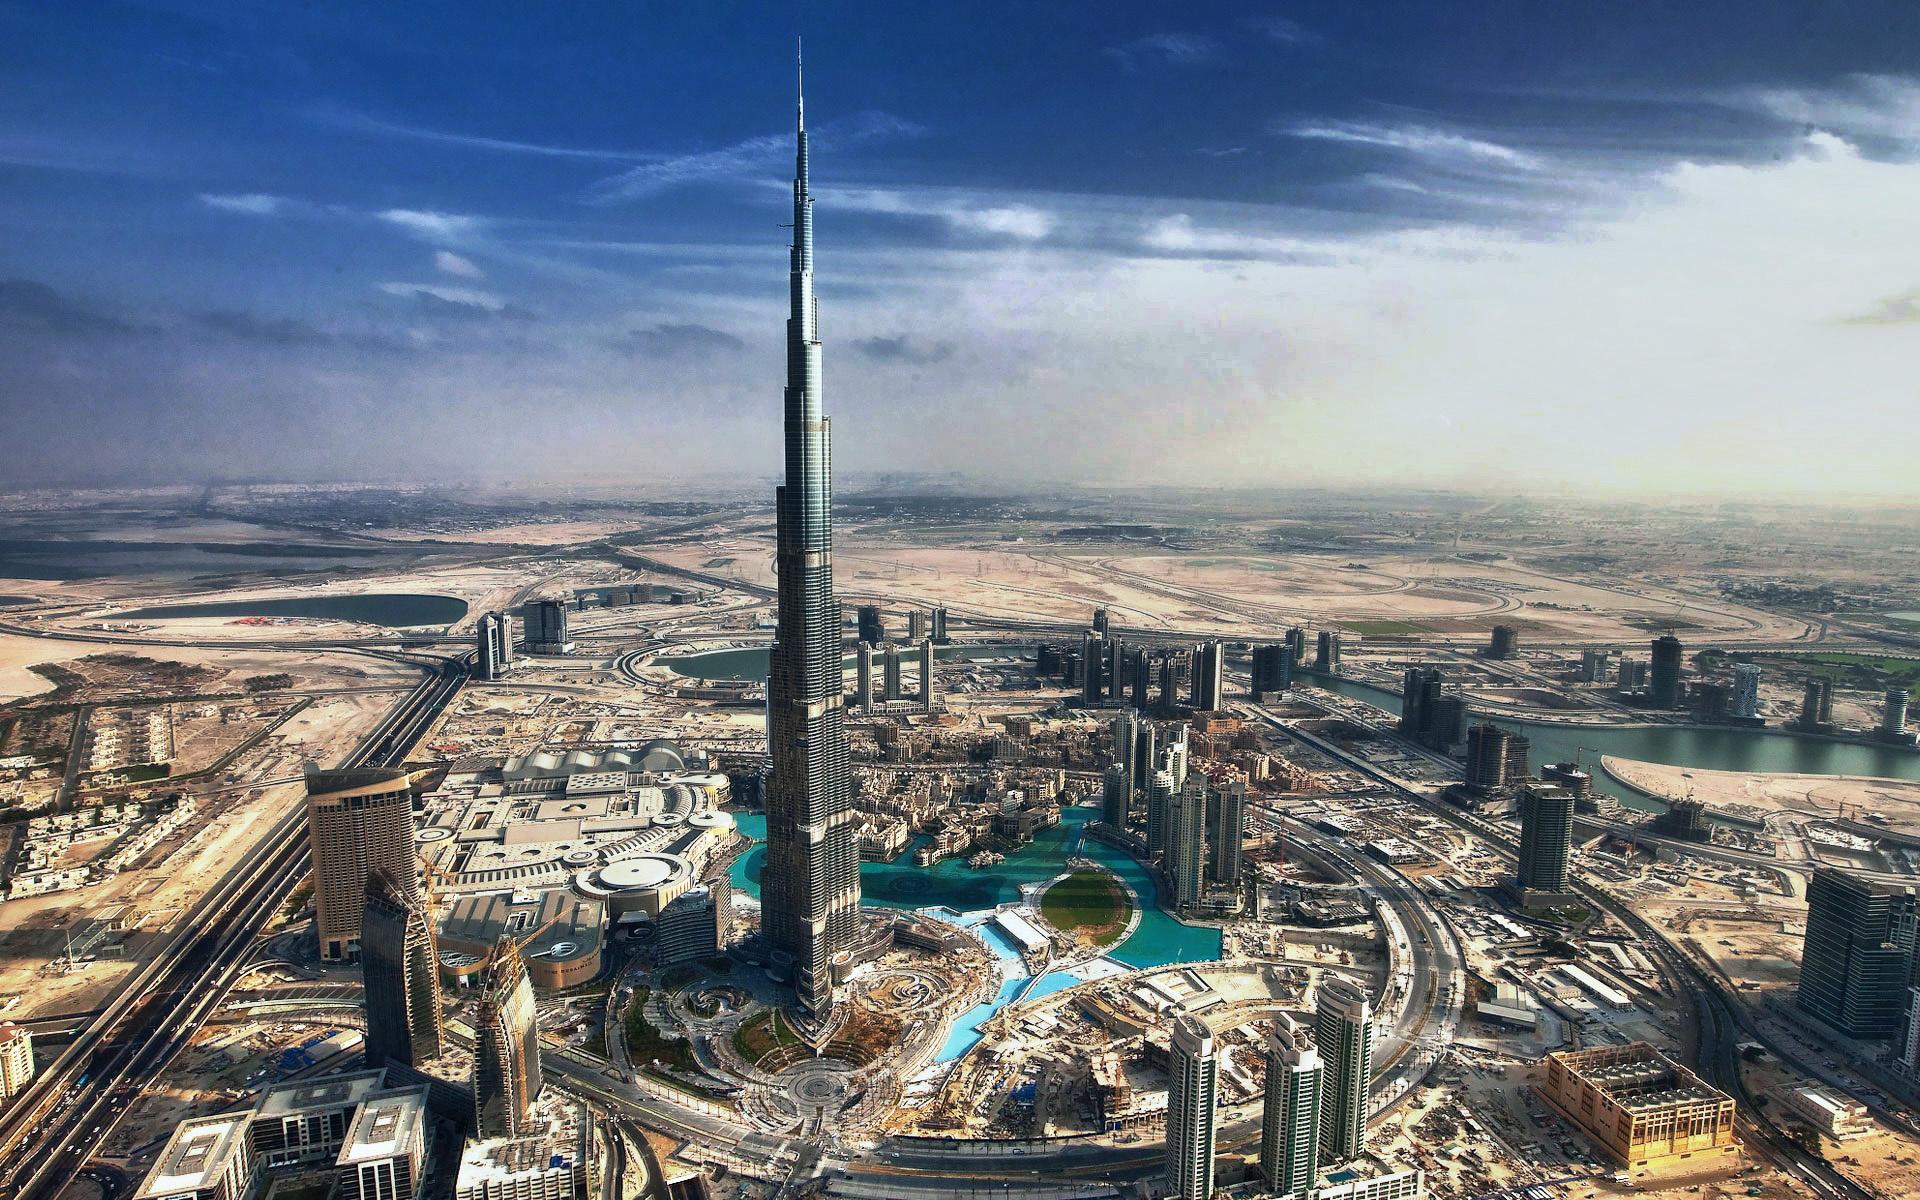 Burj Khalifa Skyscraper Wallpaper   Travel HD Wallpapers 1920x1200